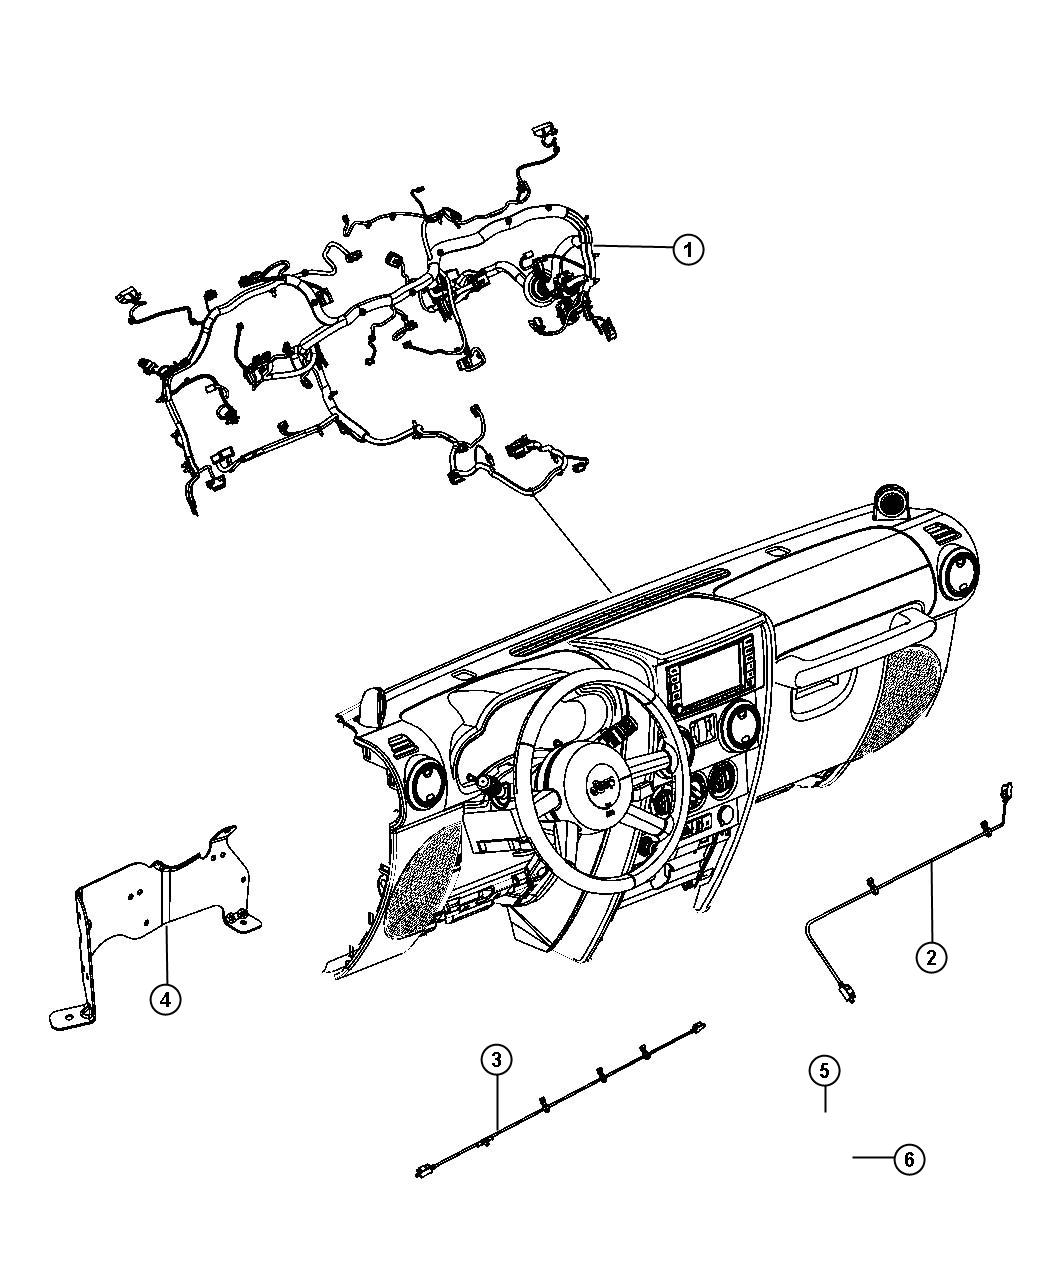 Jeep Wrangler Wiring Instrument Panel Export Manual